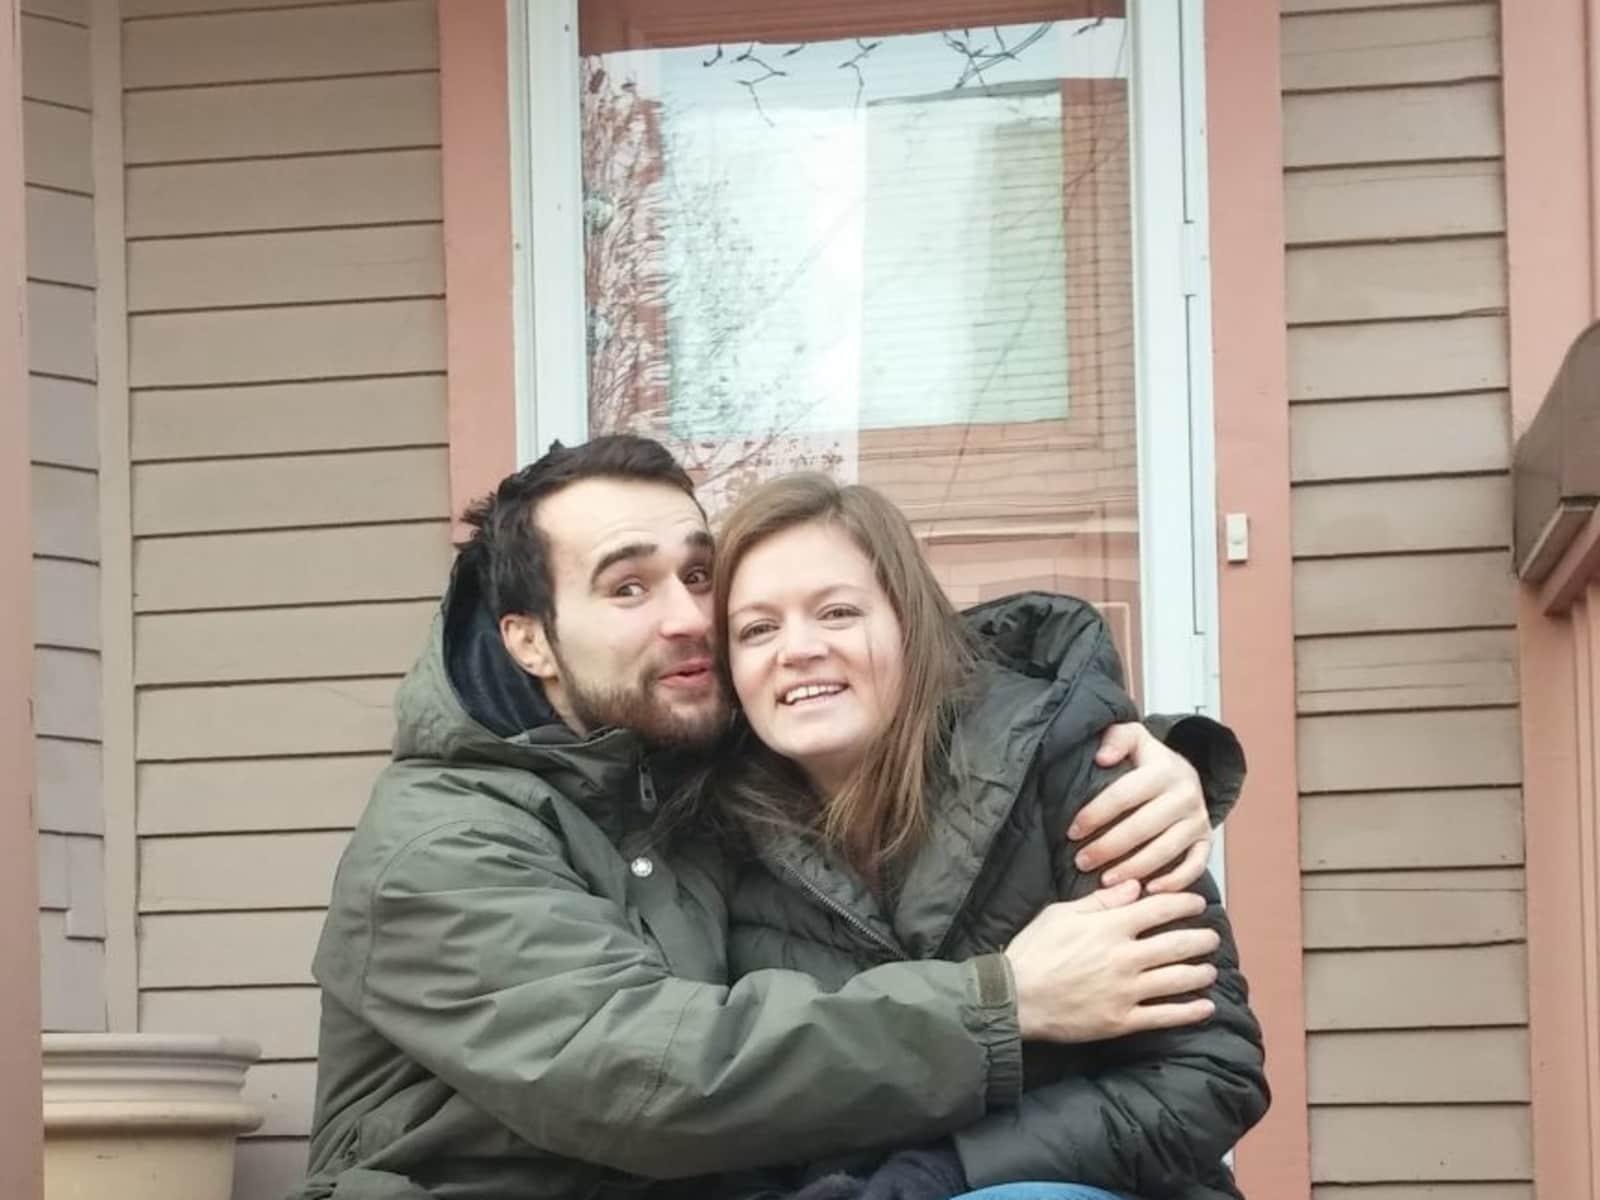 Kristina & Zachariah from Boston, Massachusetts, United States